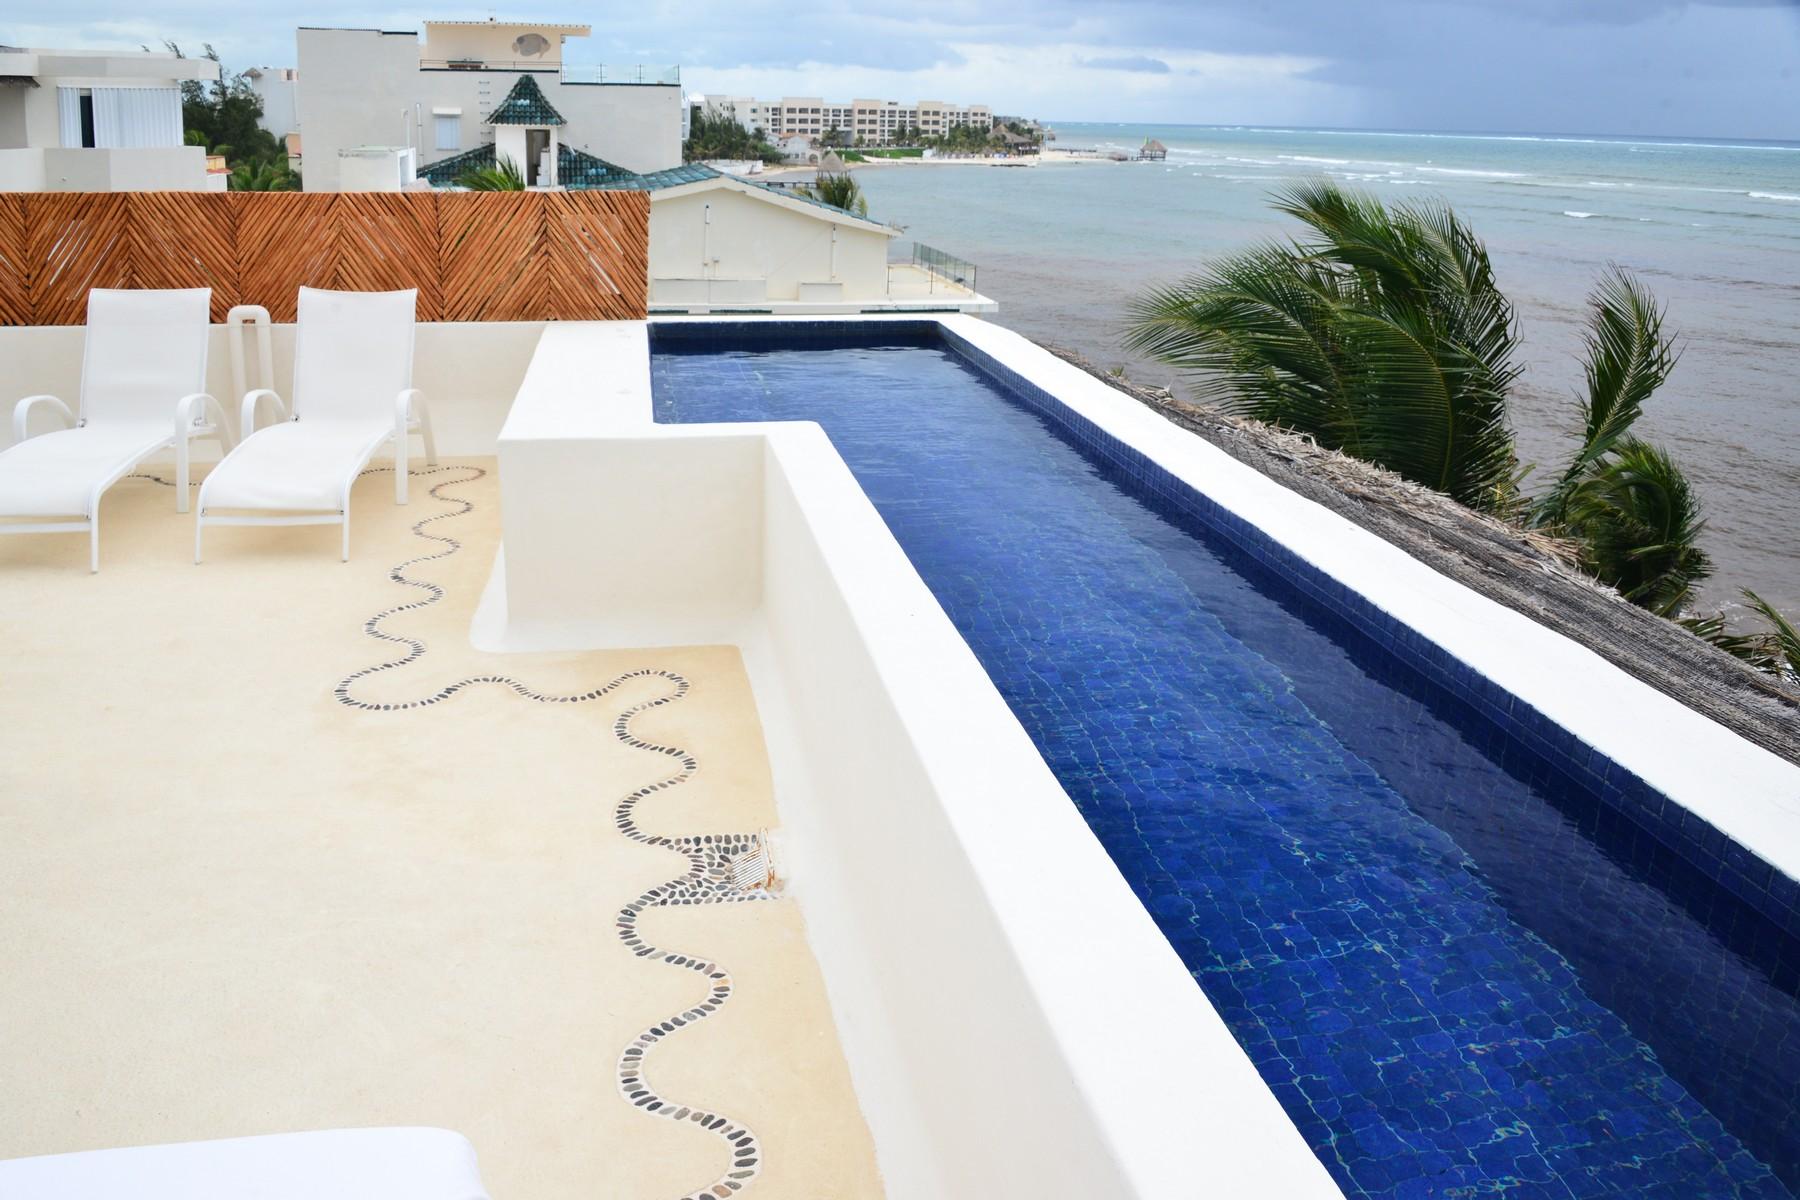 Apartment for Sale at SEAFRONT PARADISE PENTHOUSE Seafront Paradise Penthouse Predio Maria Irene, Supermzna 12, Mzna 21 13 Puerto Morelos, 77930 Mexico